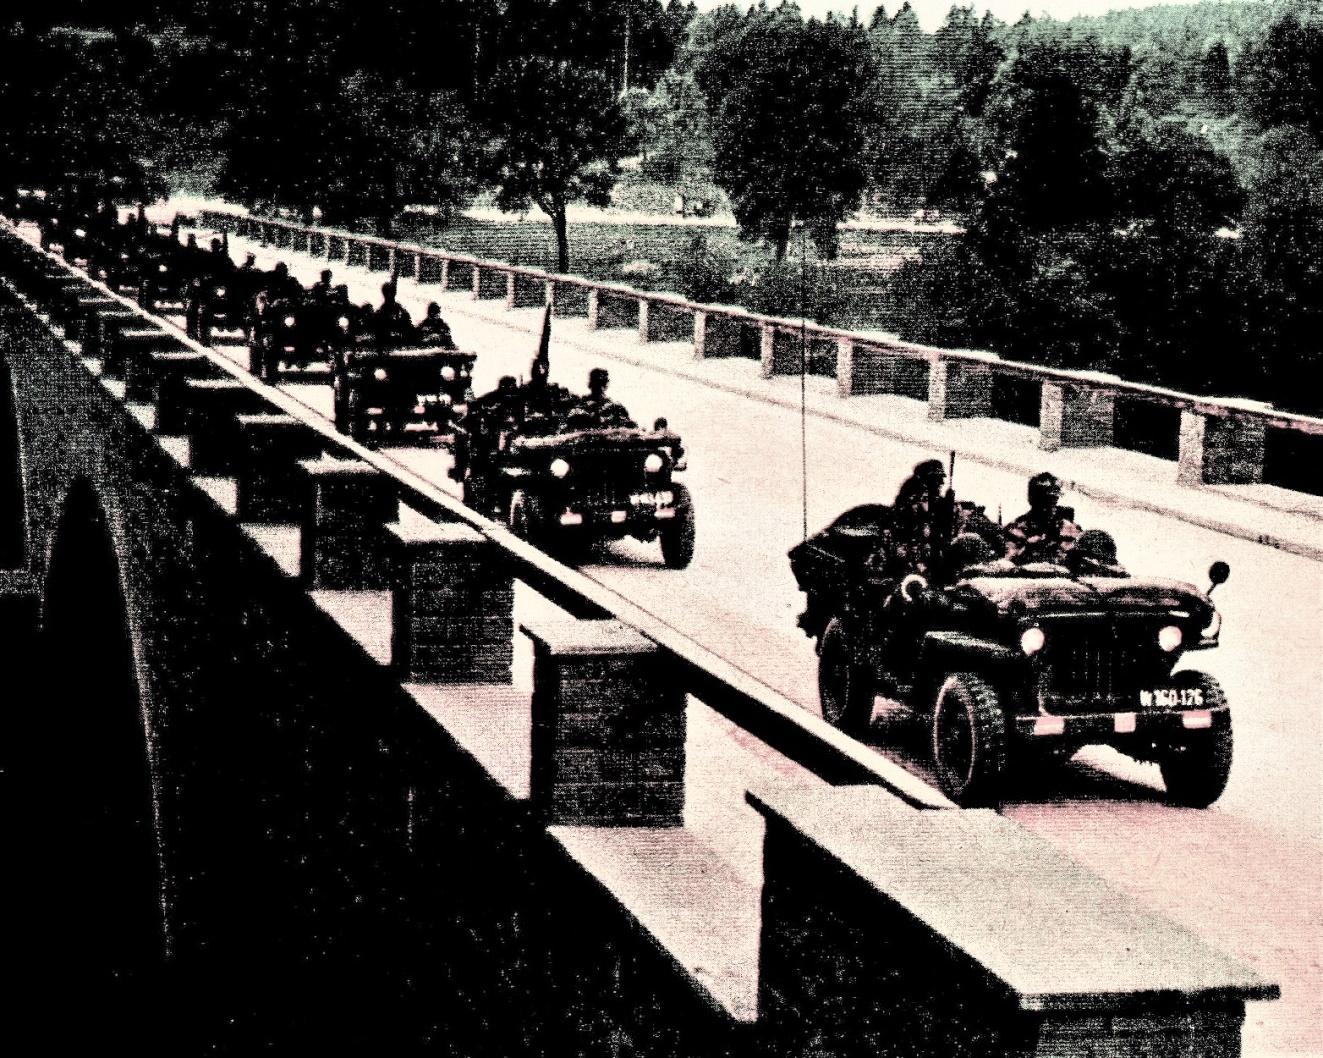 D:\Archiv Nemeth\Fzg-Gerät-Ausrüstung\Fahrzeuge\Mehrspurige Kfz\BH Fahrzeuge\Jeep\Kolonne.jpeg